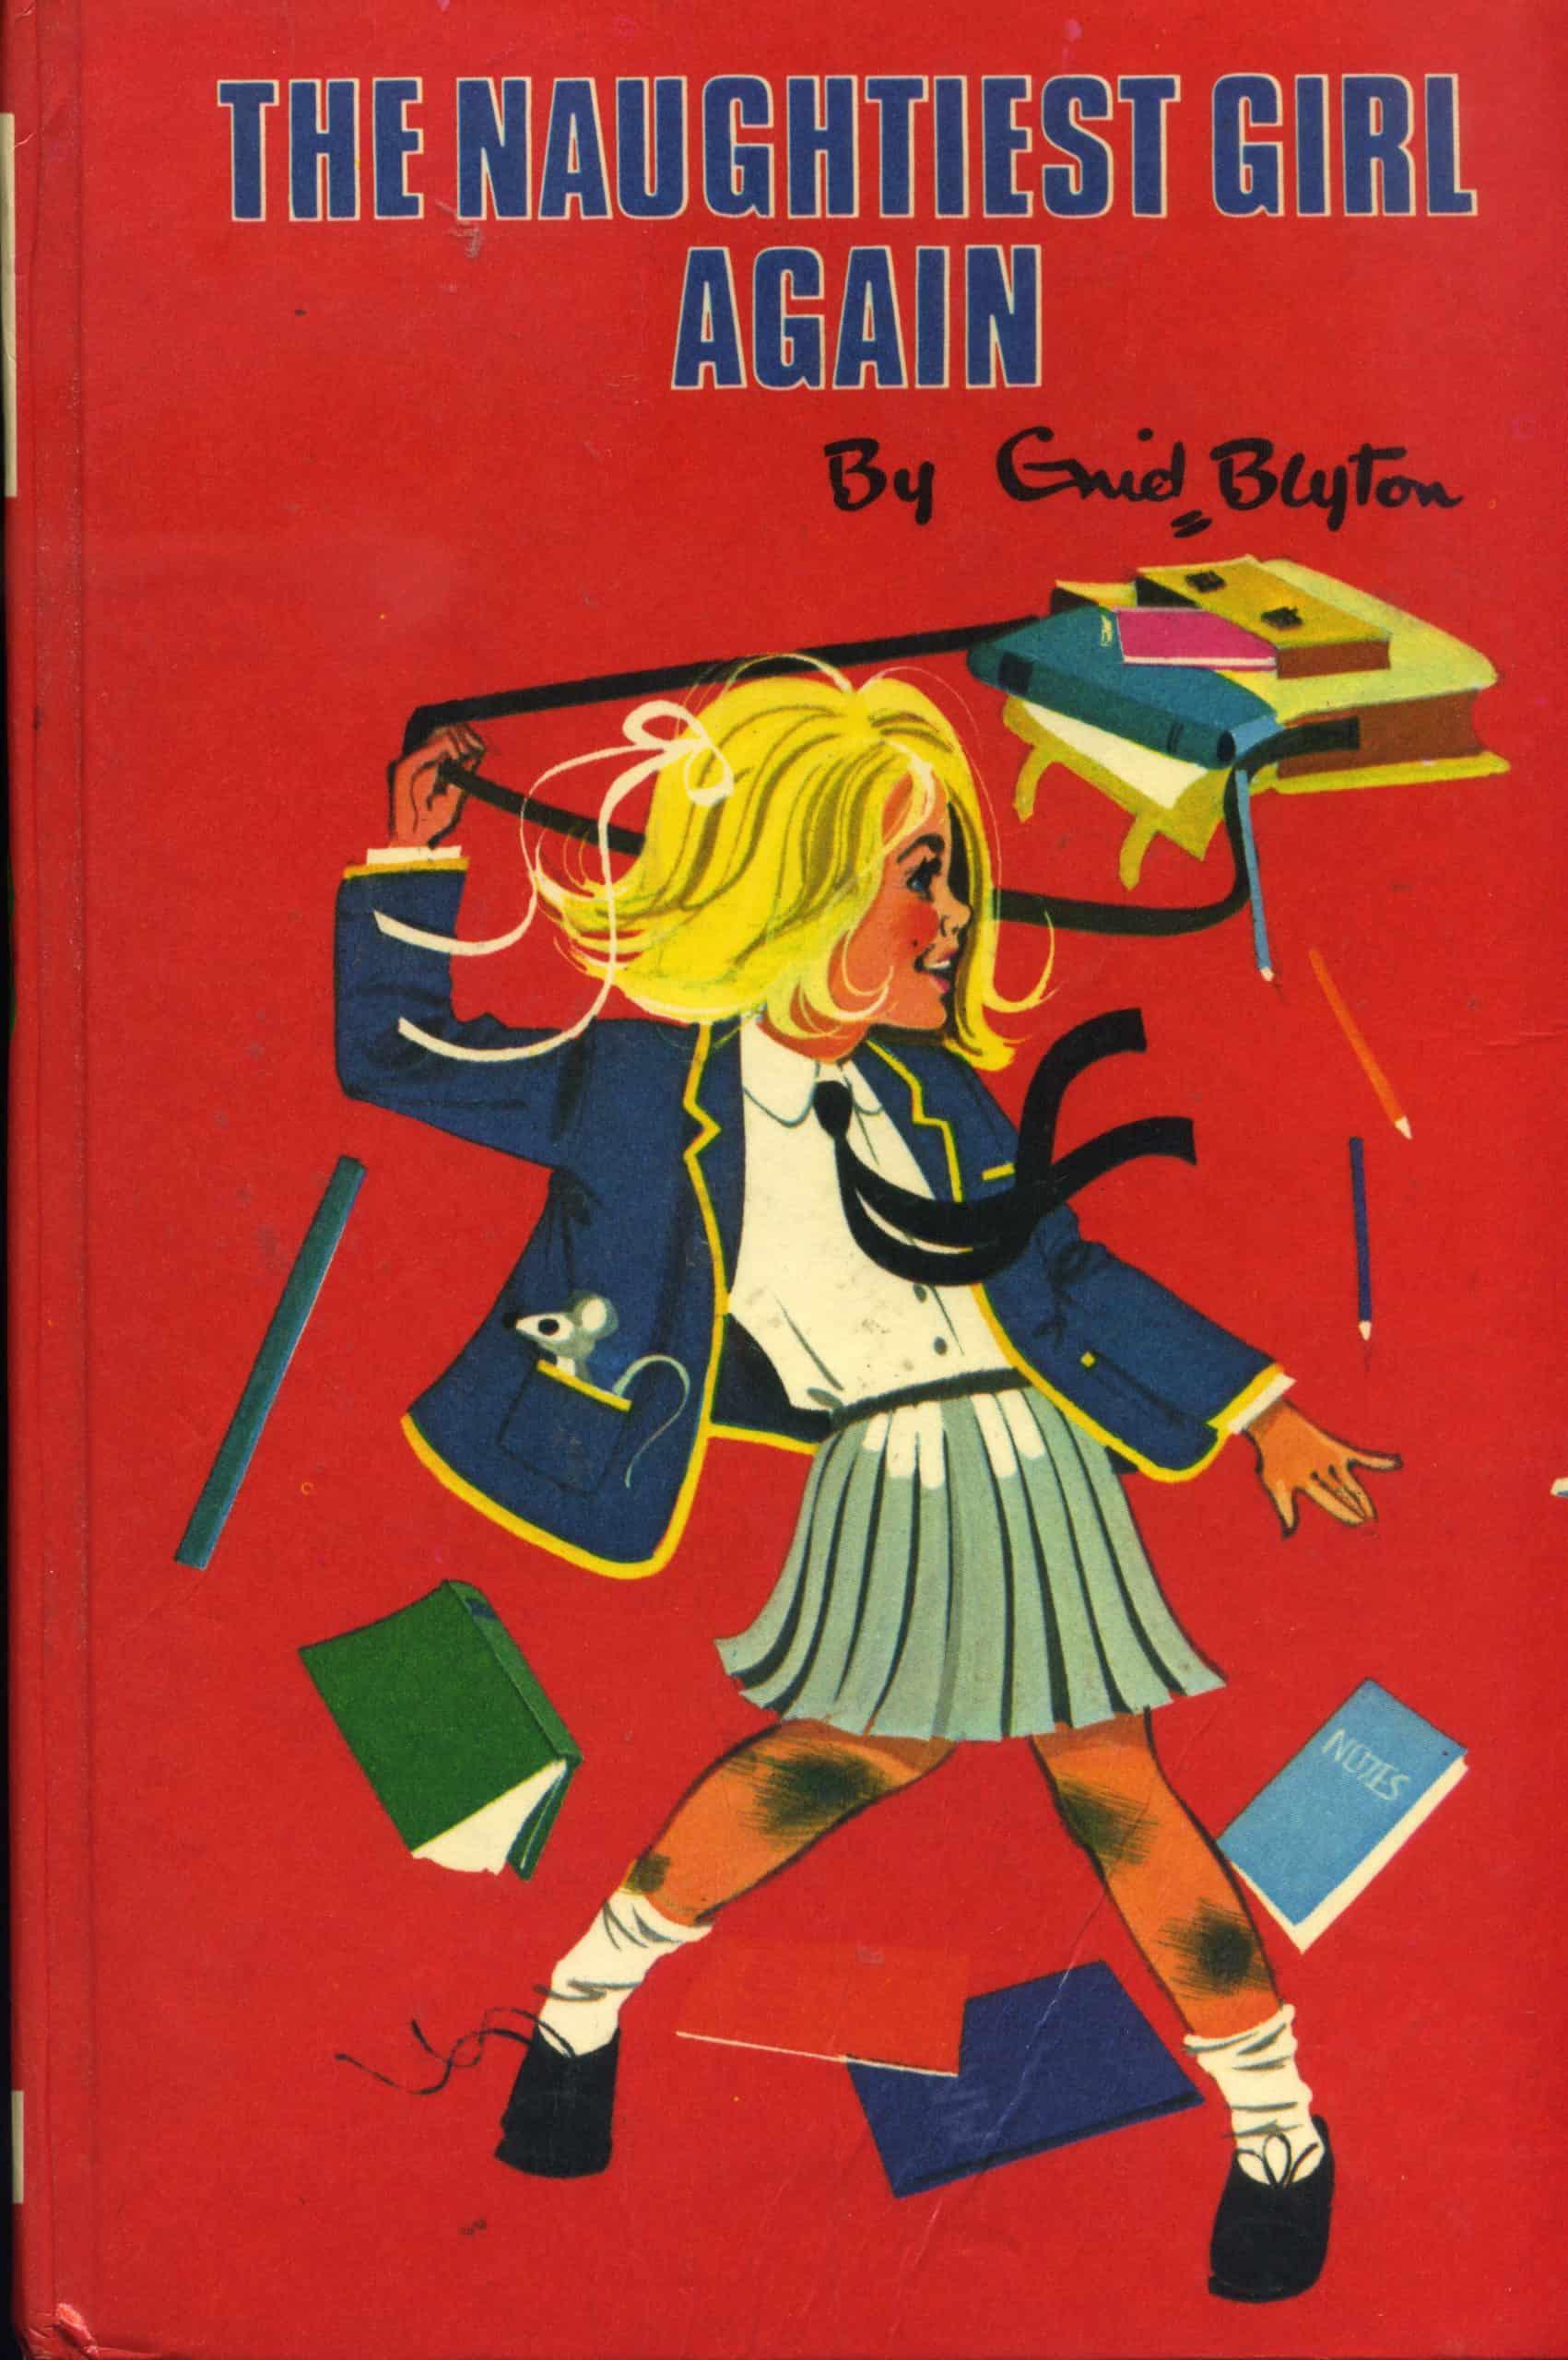 The naughtiest girl again enid blyton book